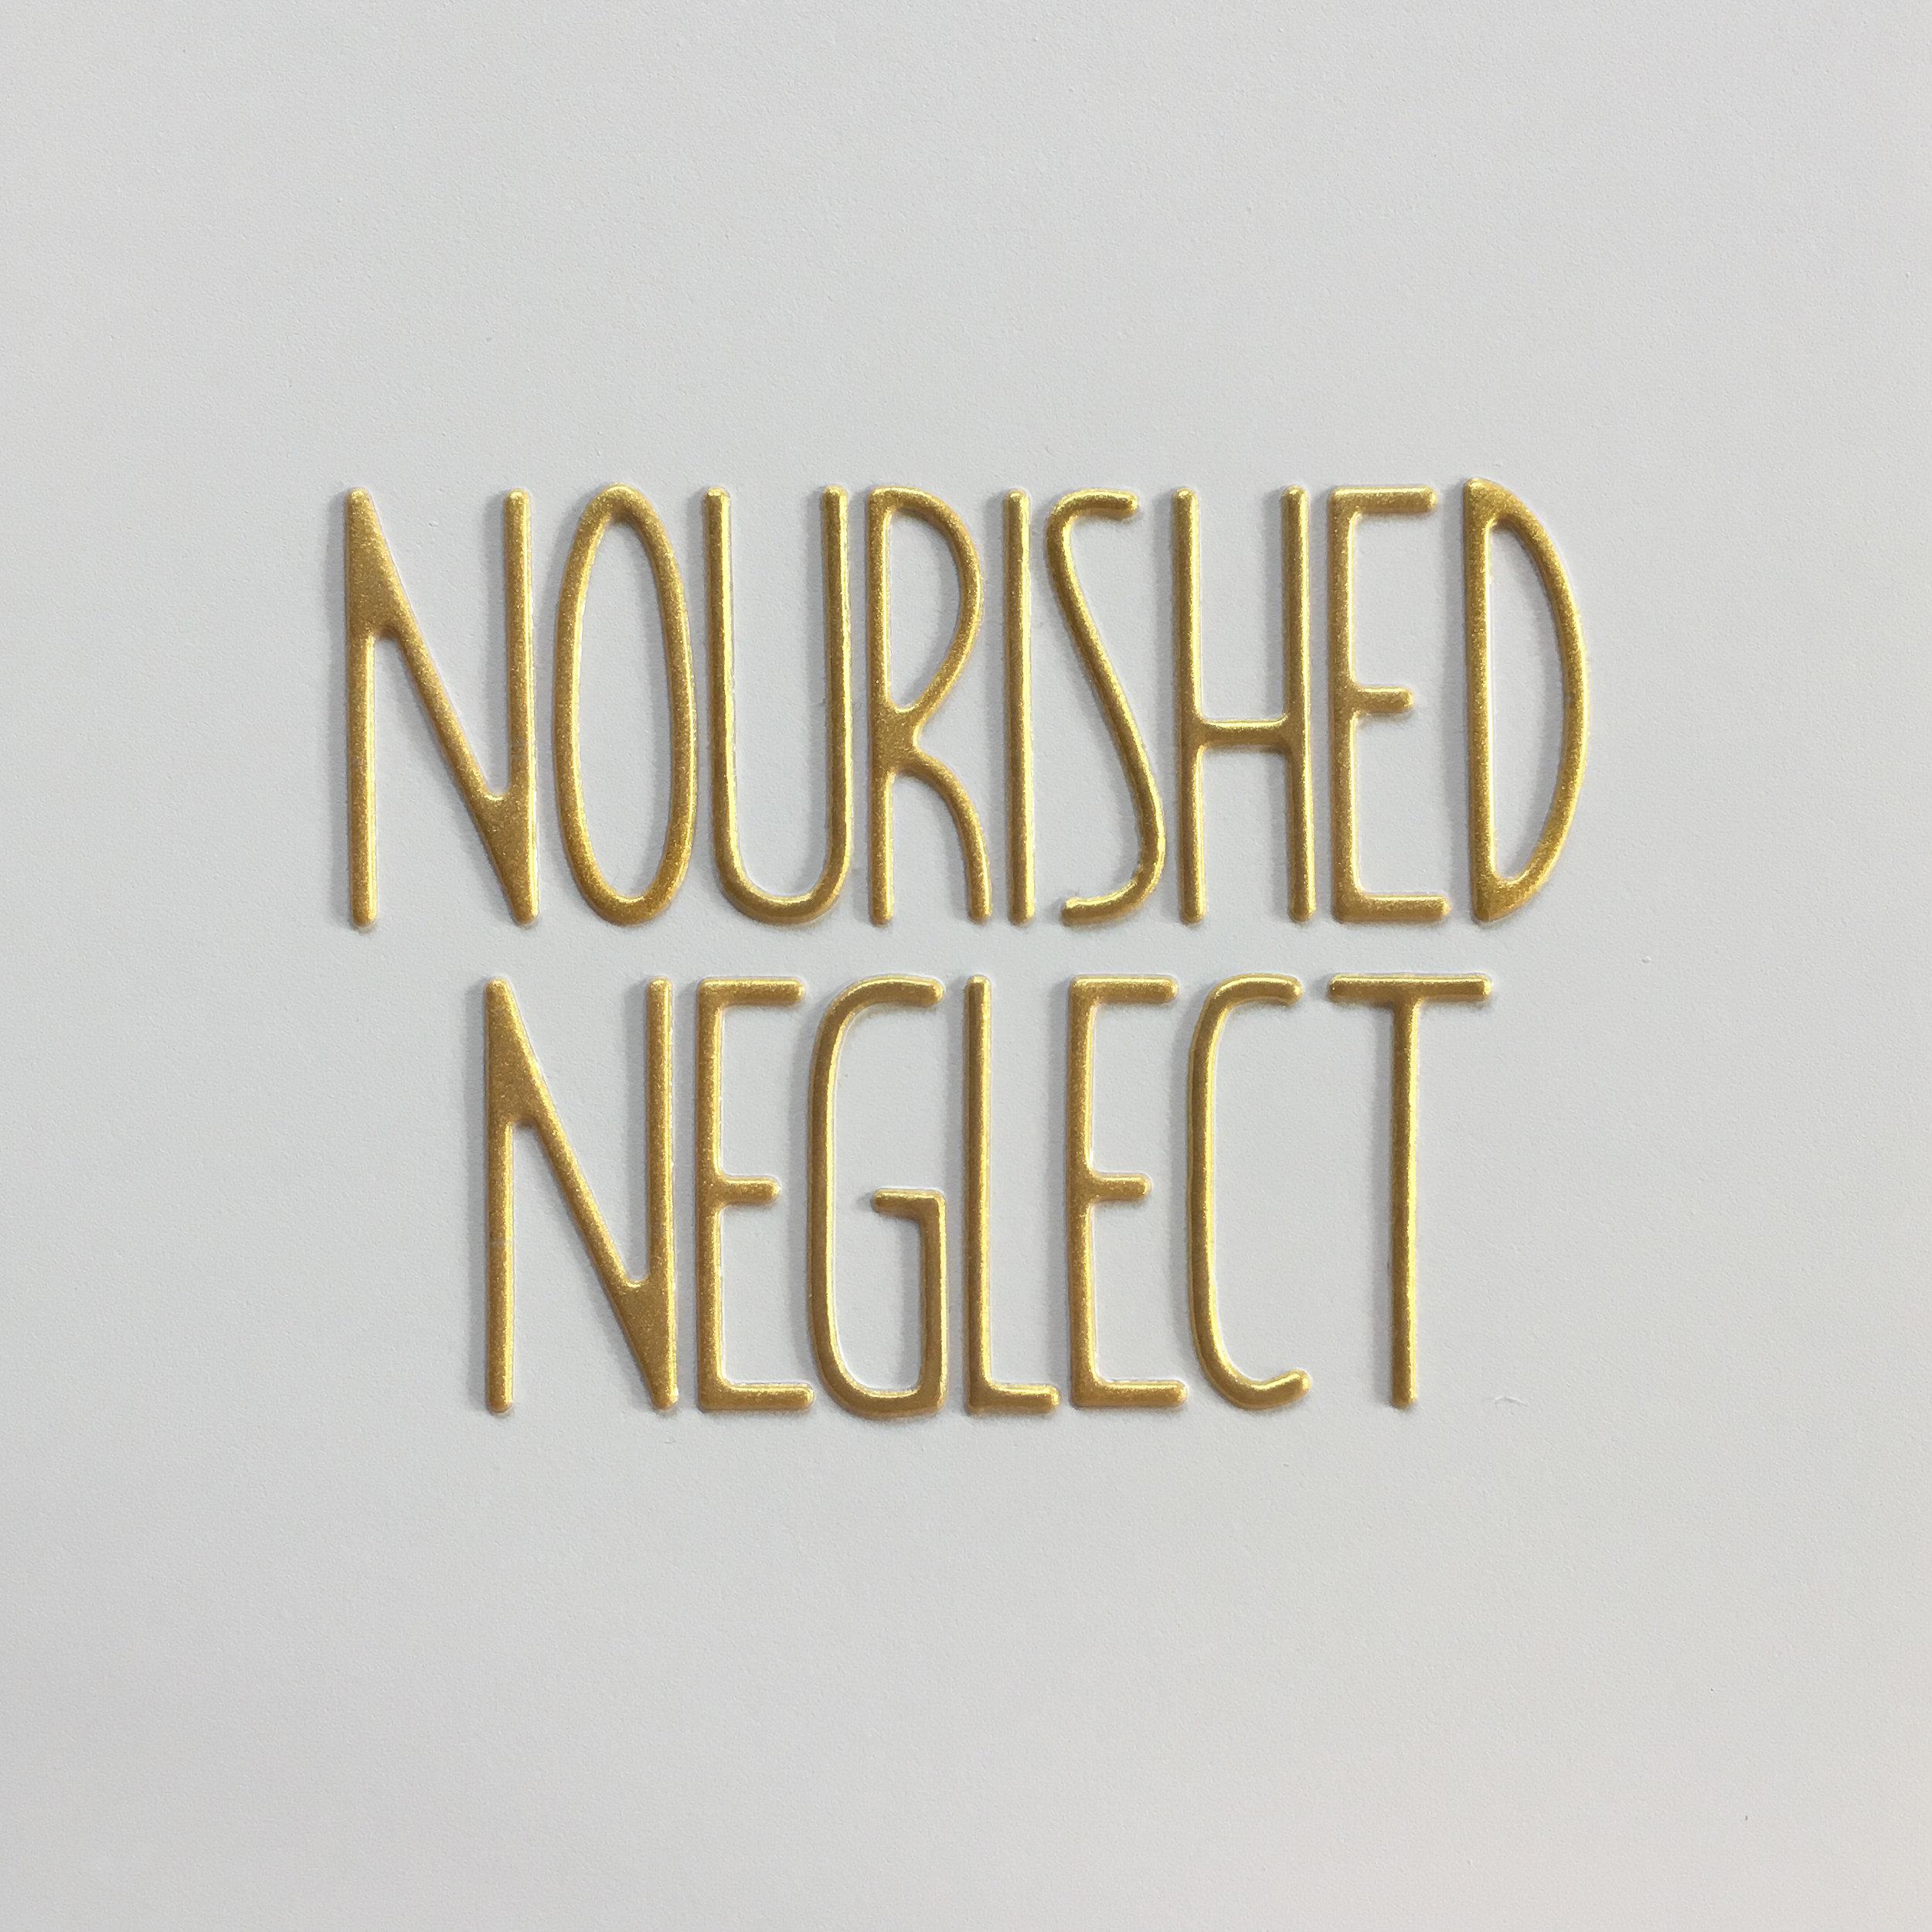 nourished neglect.jpg